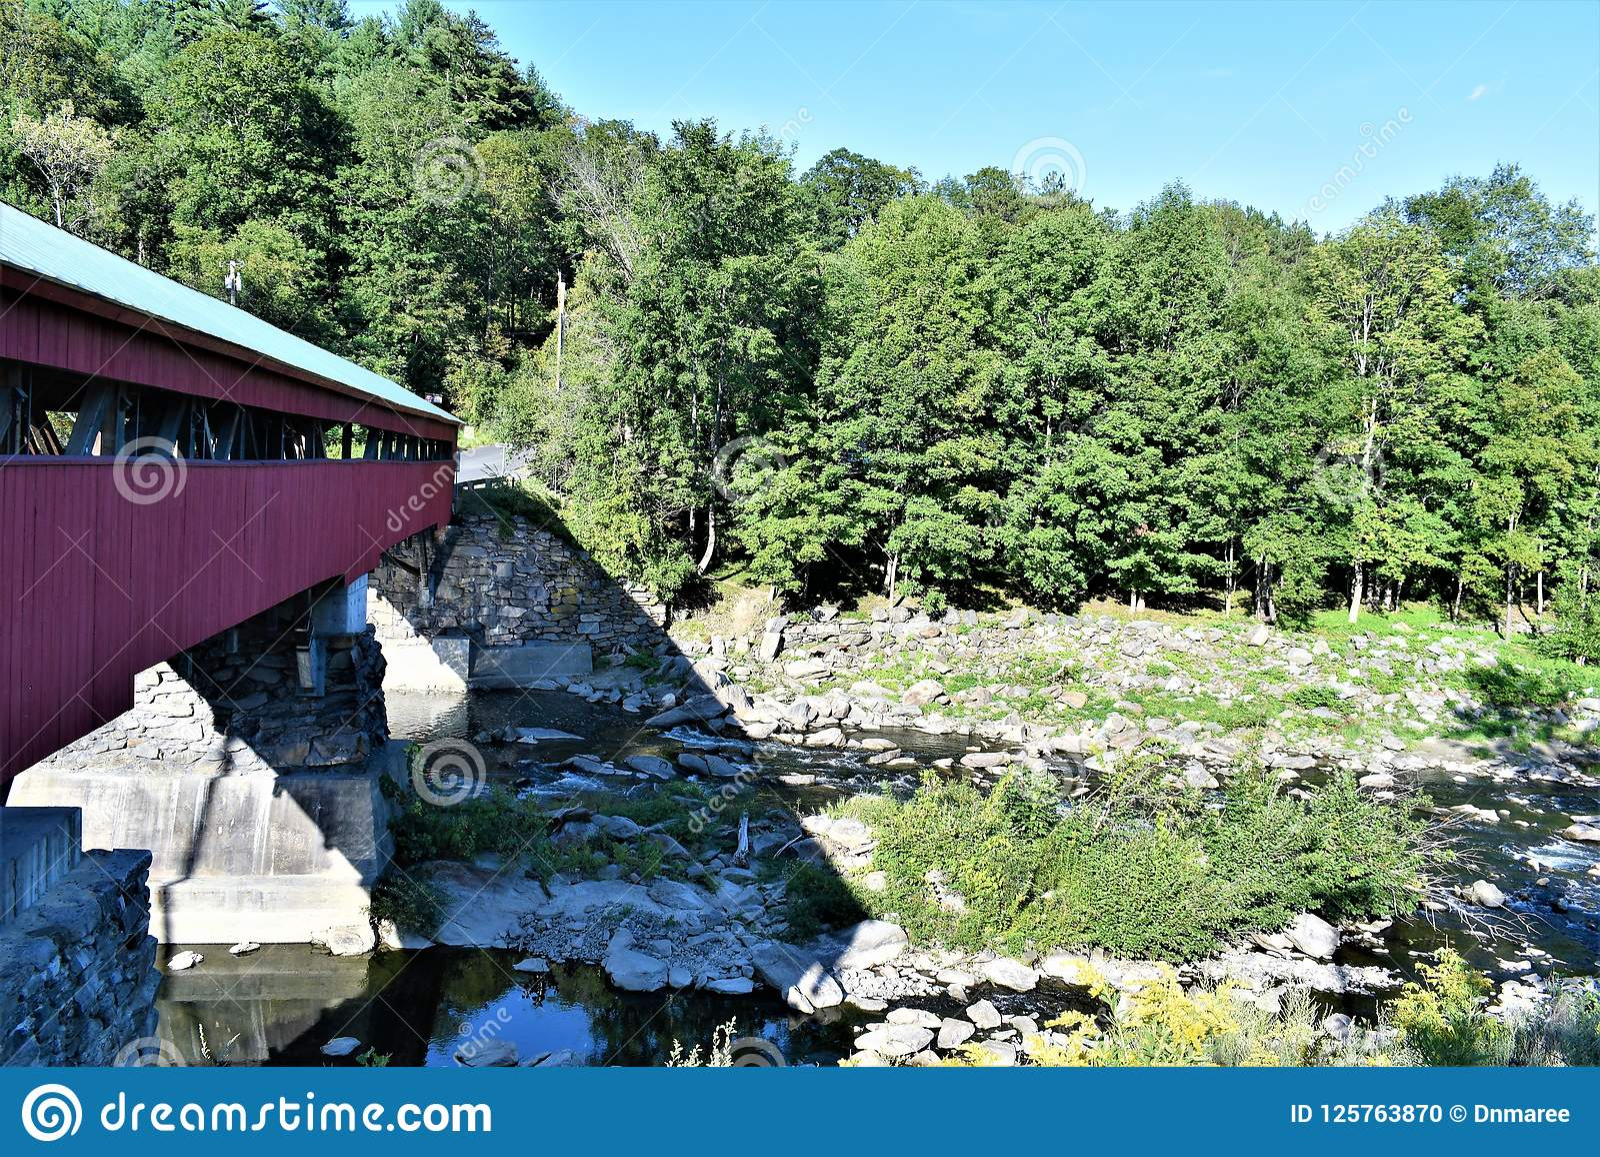 Taftsville被遮盖的桥在Taftsville村庄在伍德斯托克,温莎县,佛蒙特,美国镇